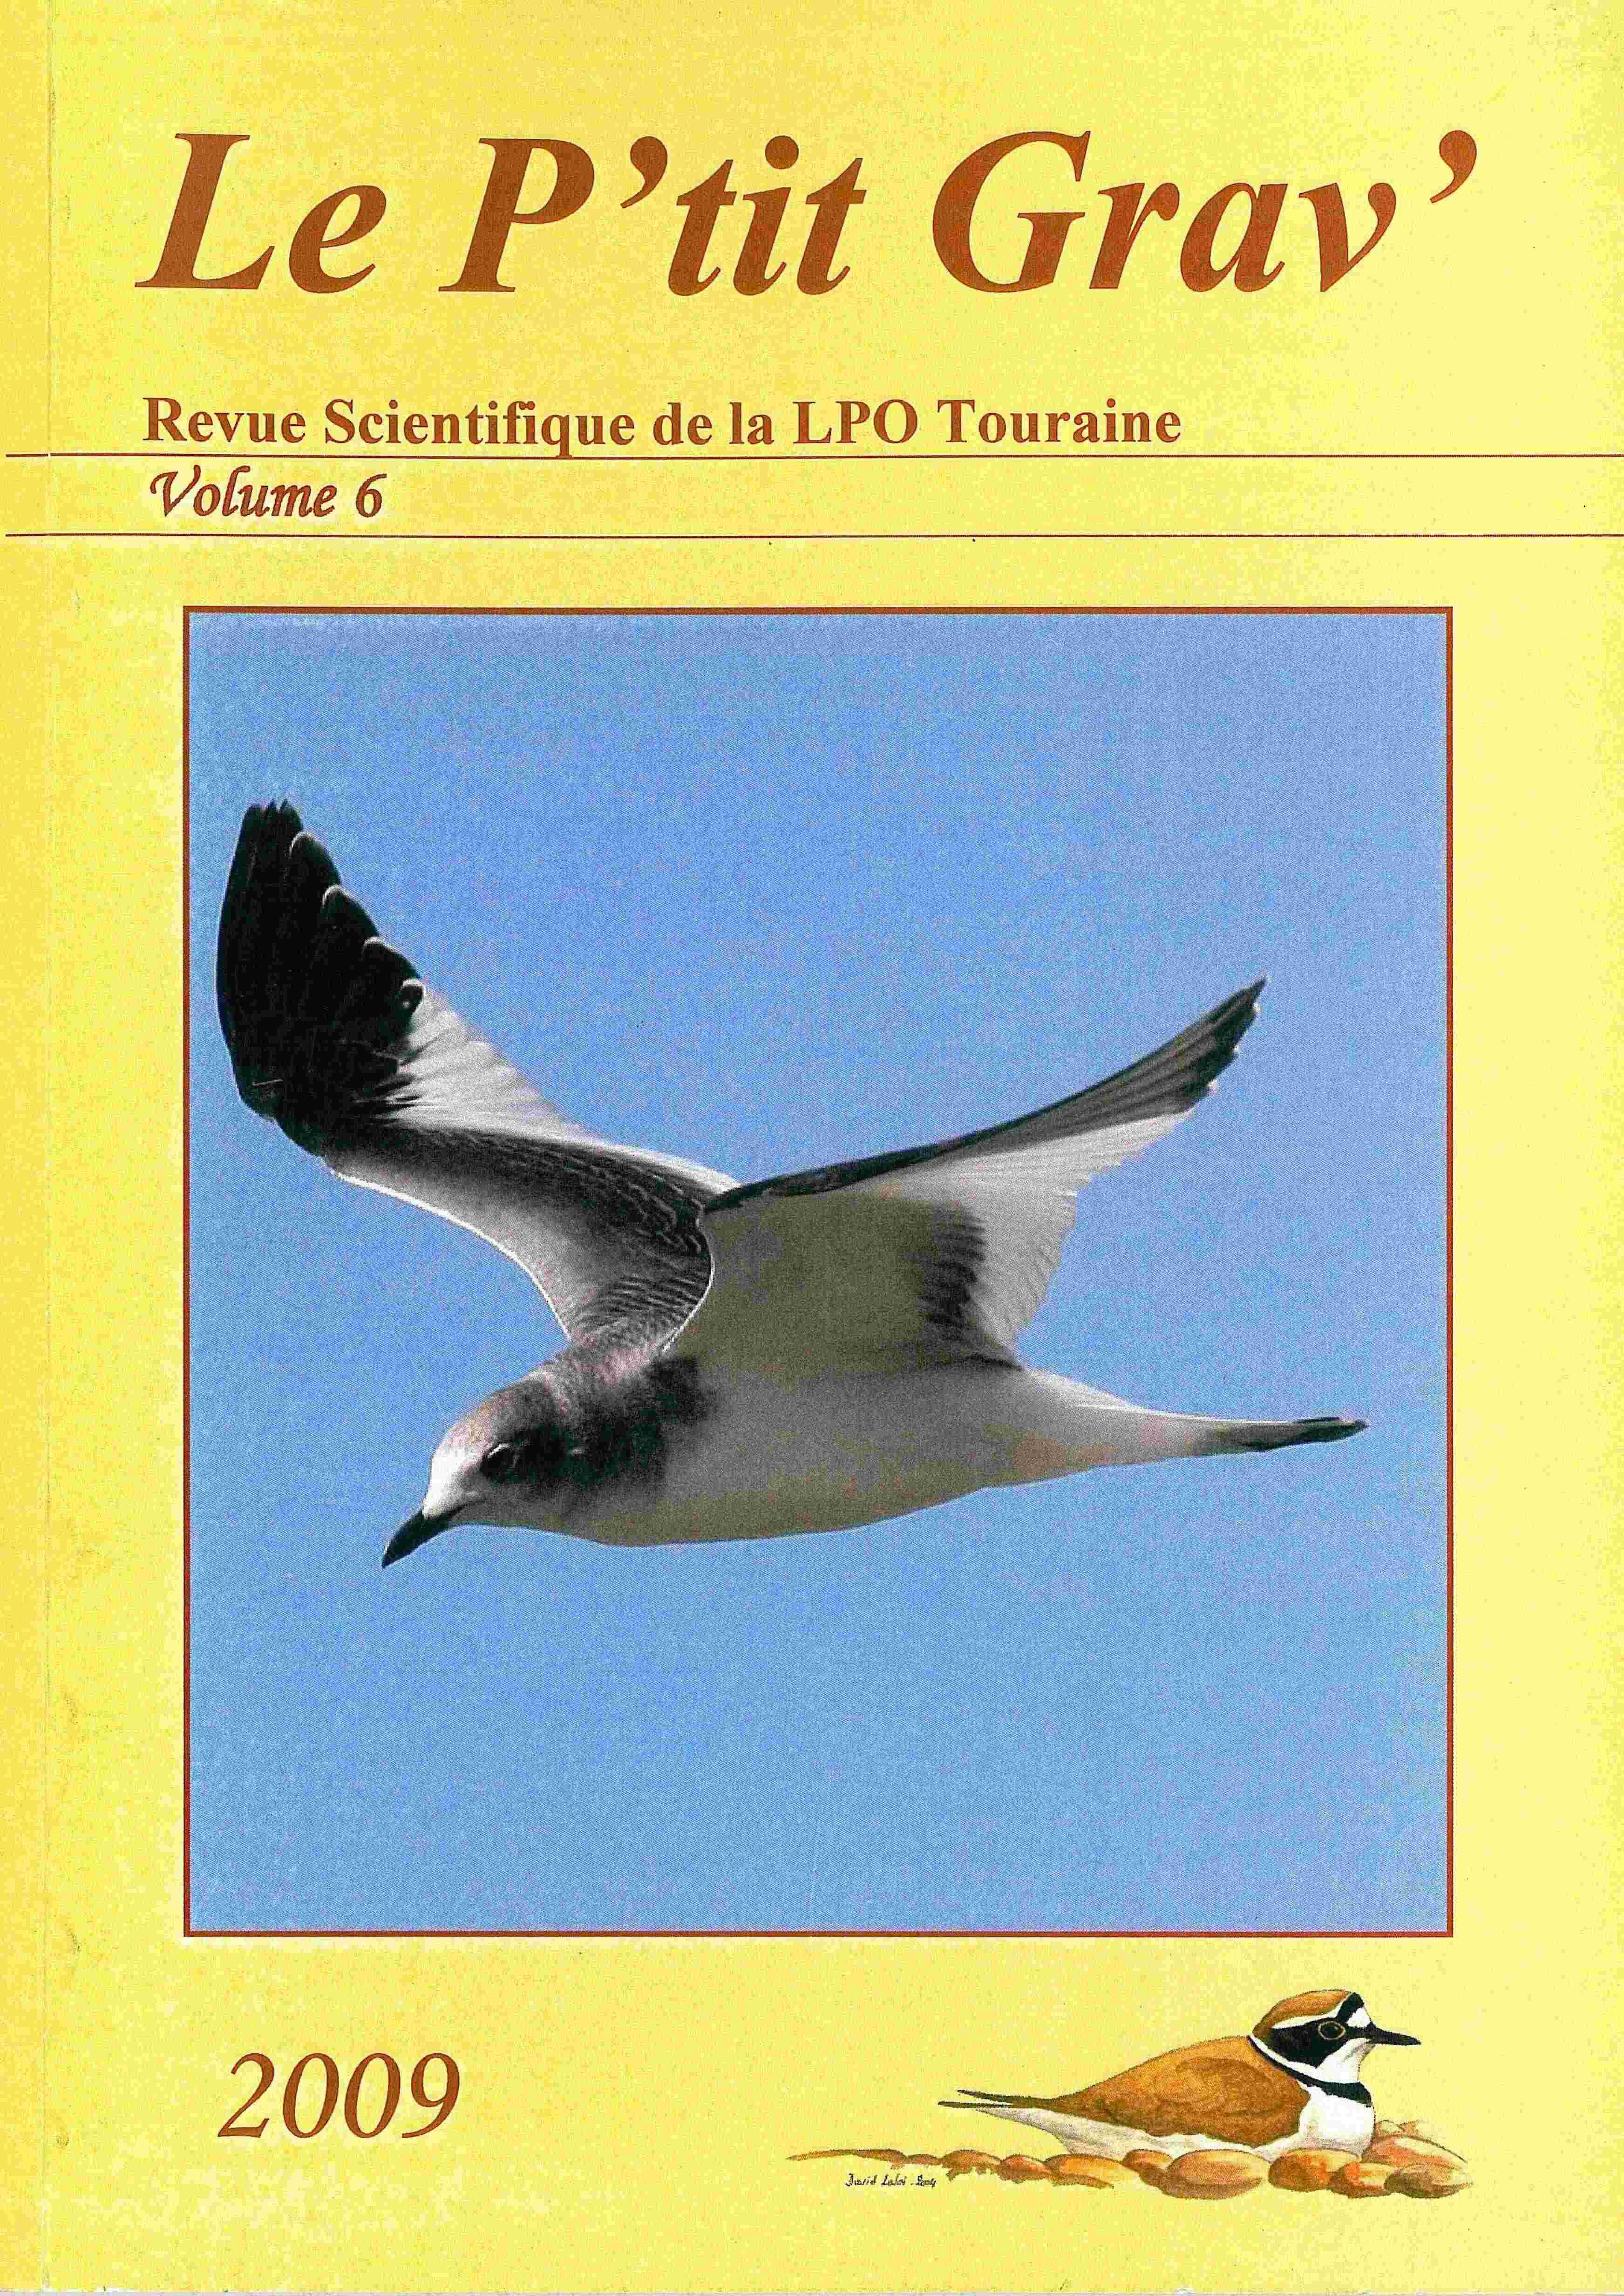 https://cdnfiles2.biolovision.net/www.faune-touraine.org/userfiles/MonDossier/PtitGravvol6.jpg